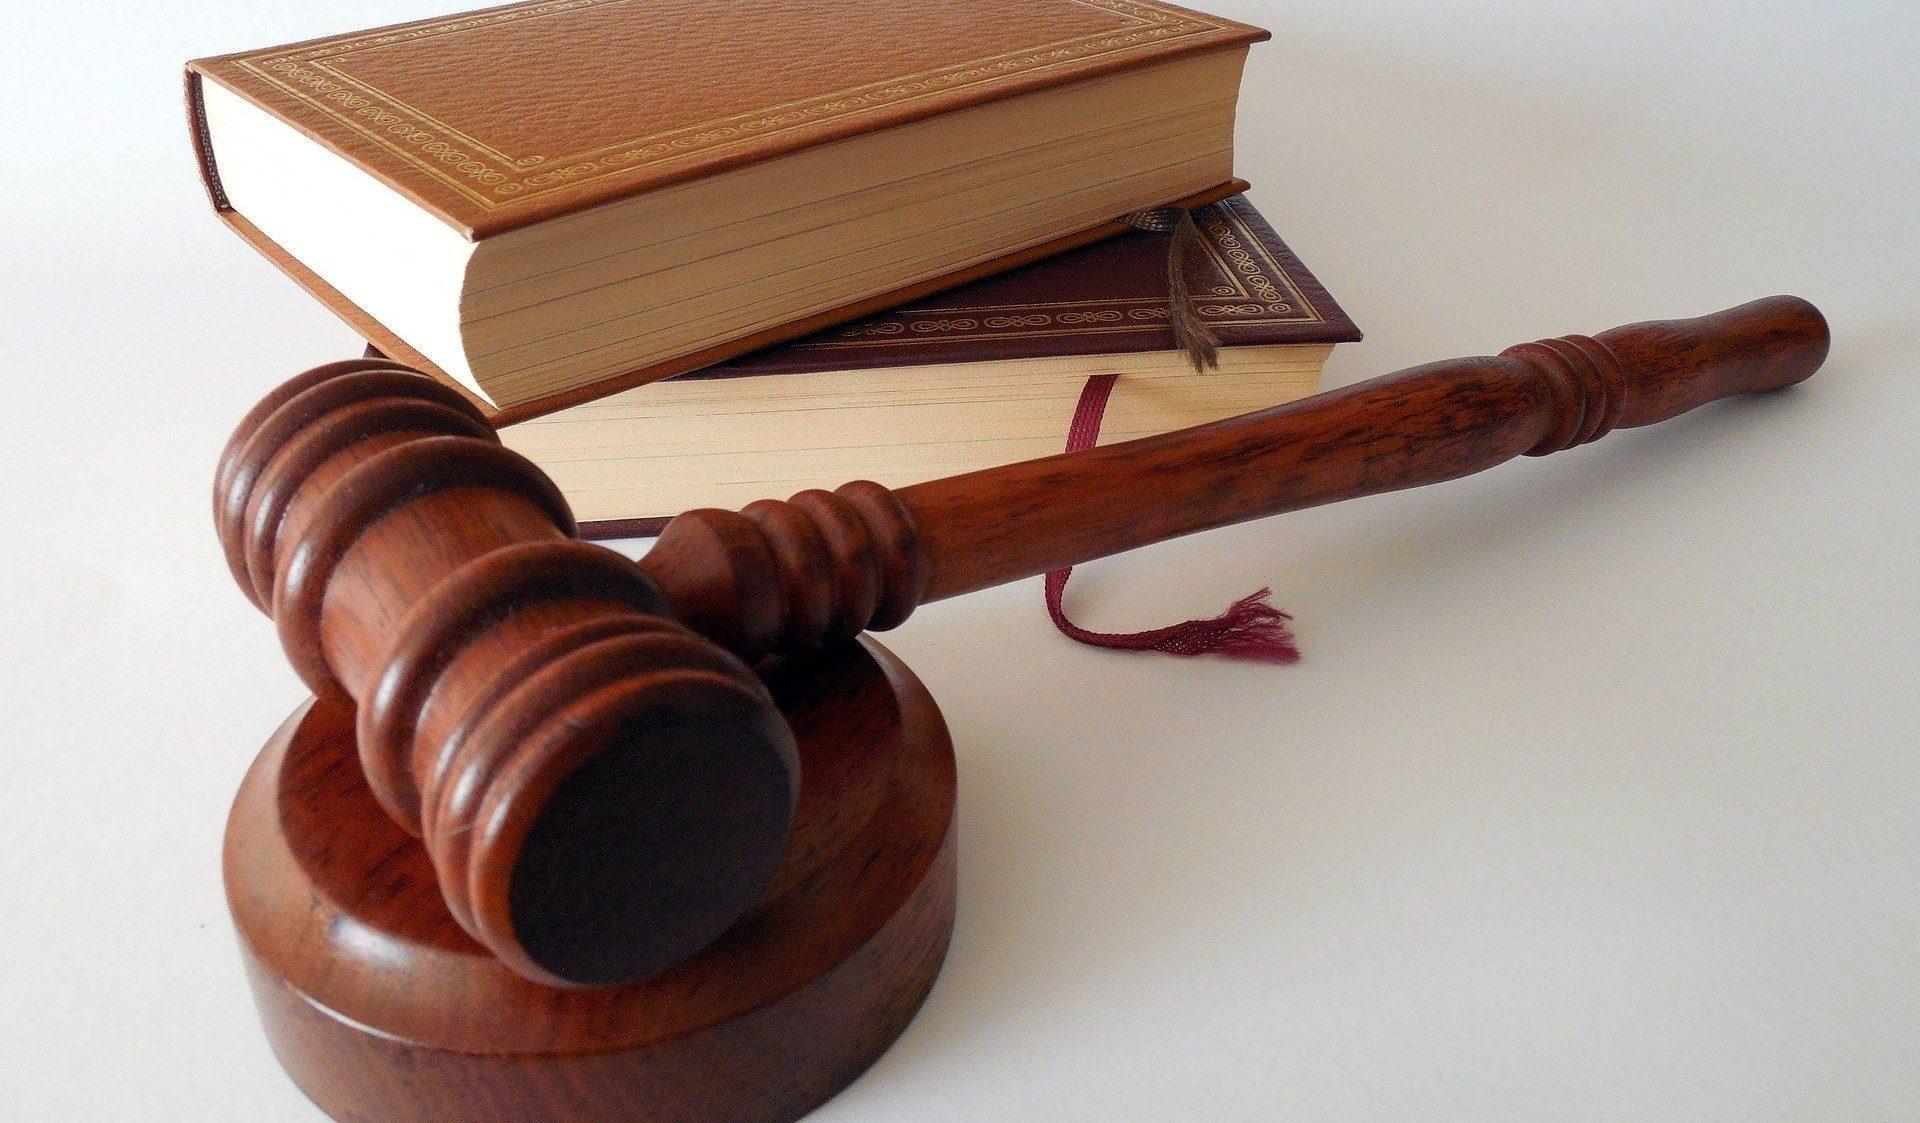 Legge Tribunale Lex